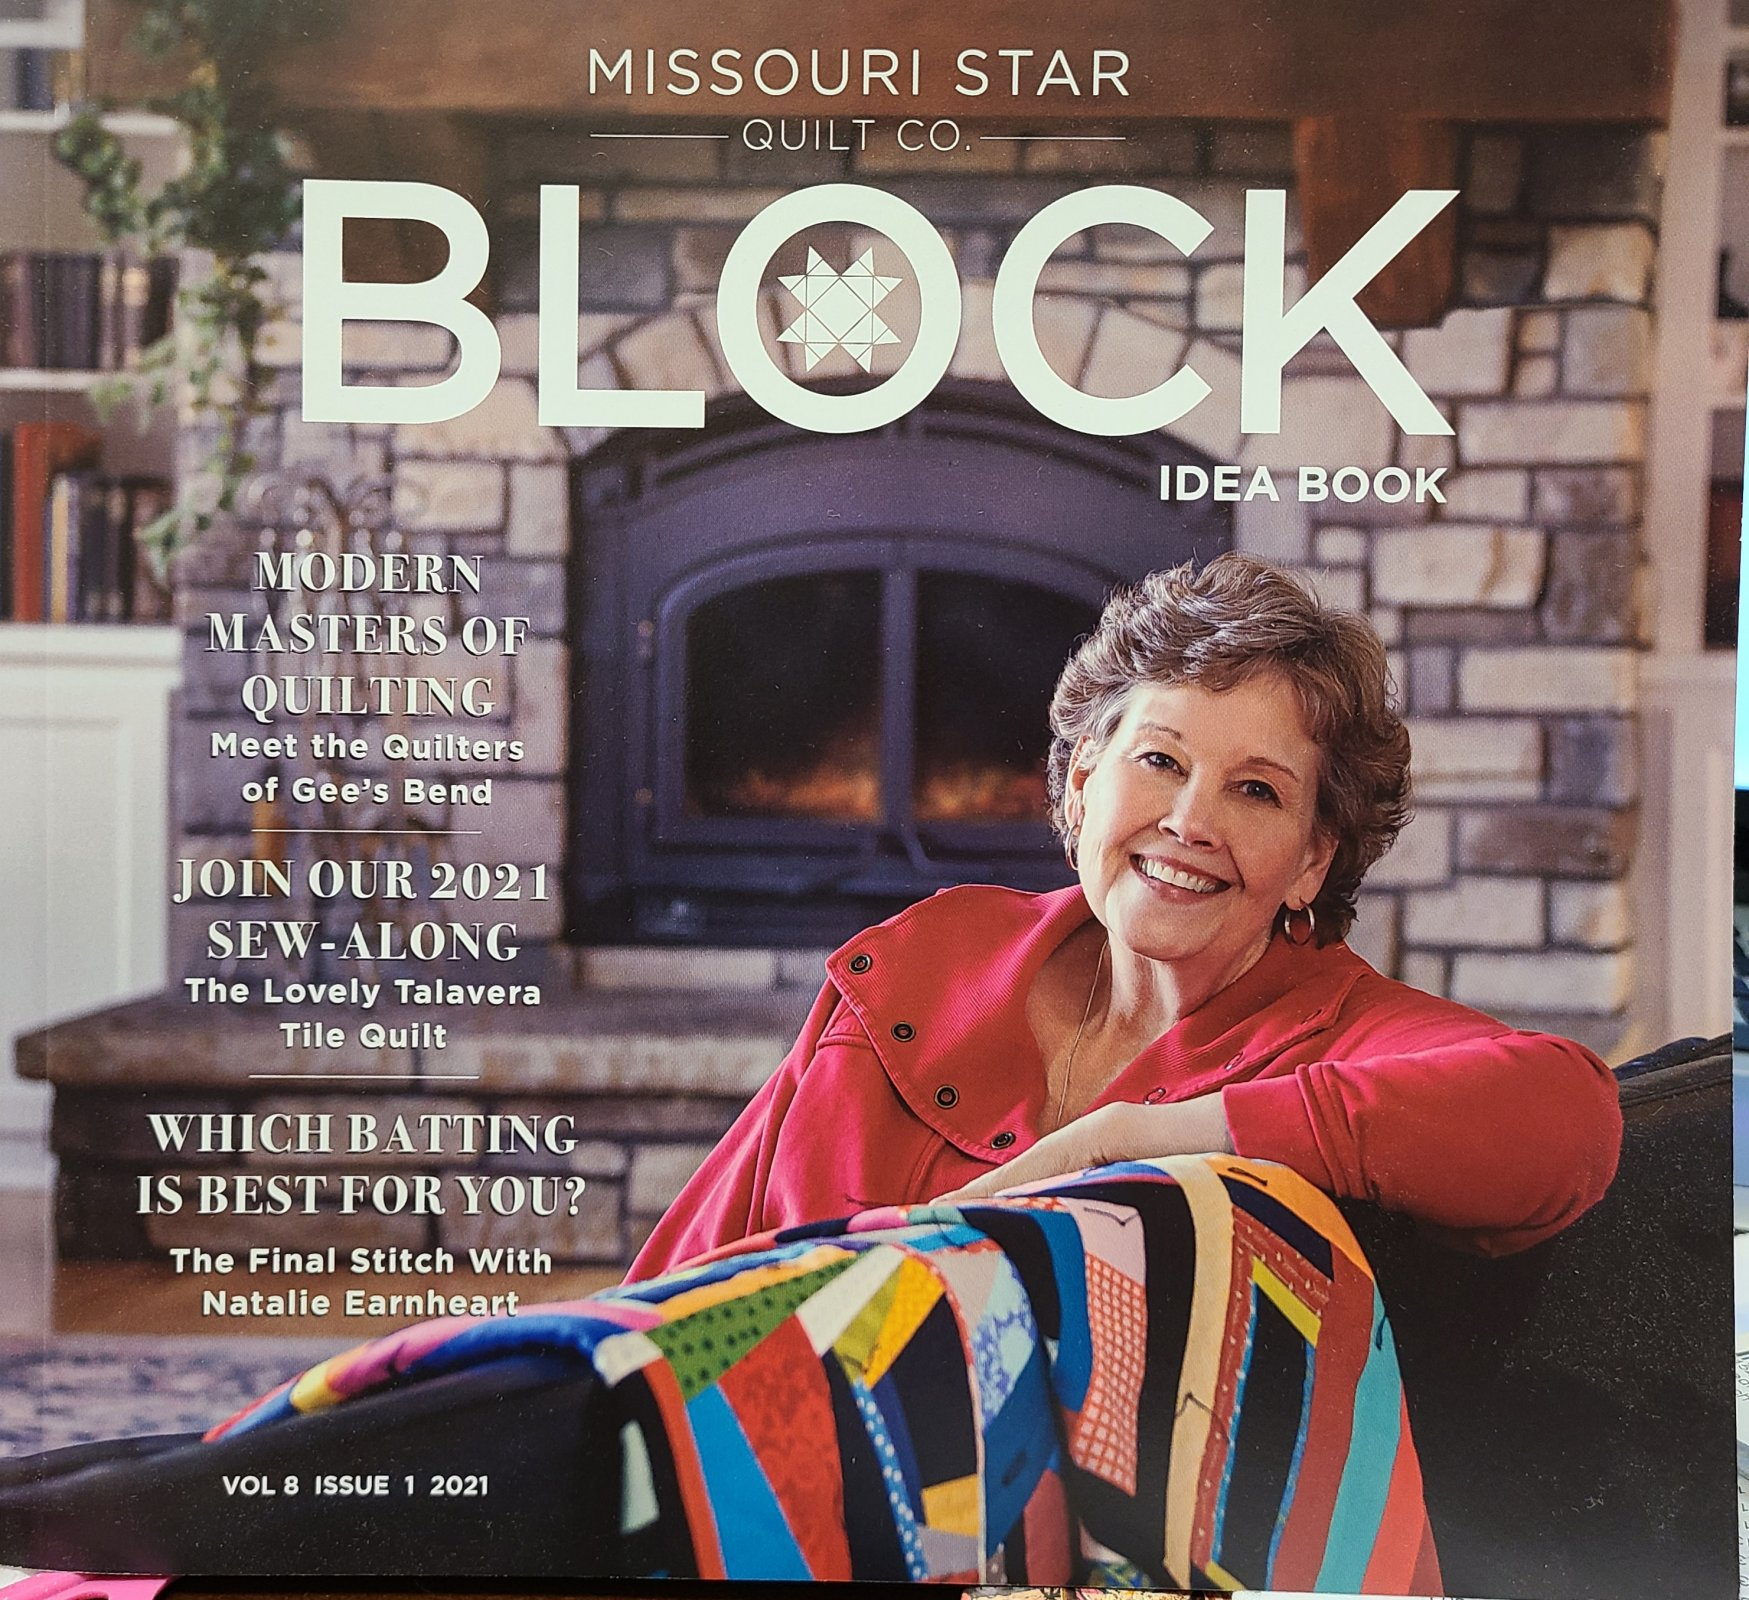 Block Book Vol 8 Issue 1 2021